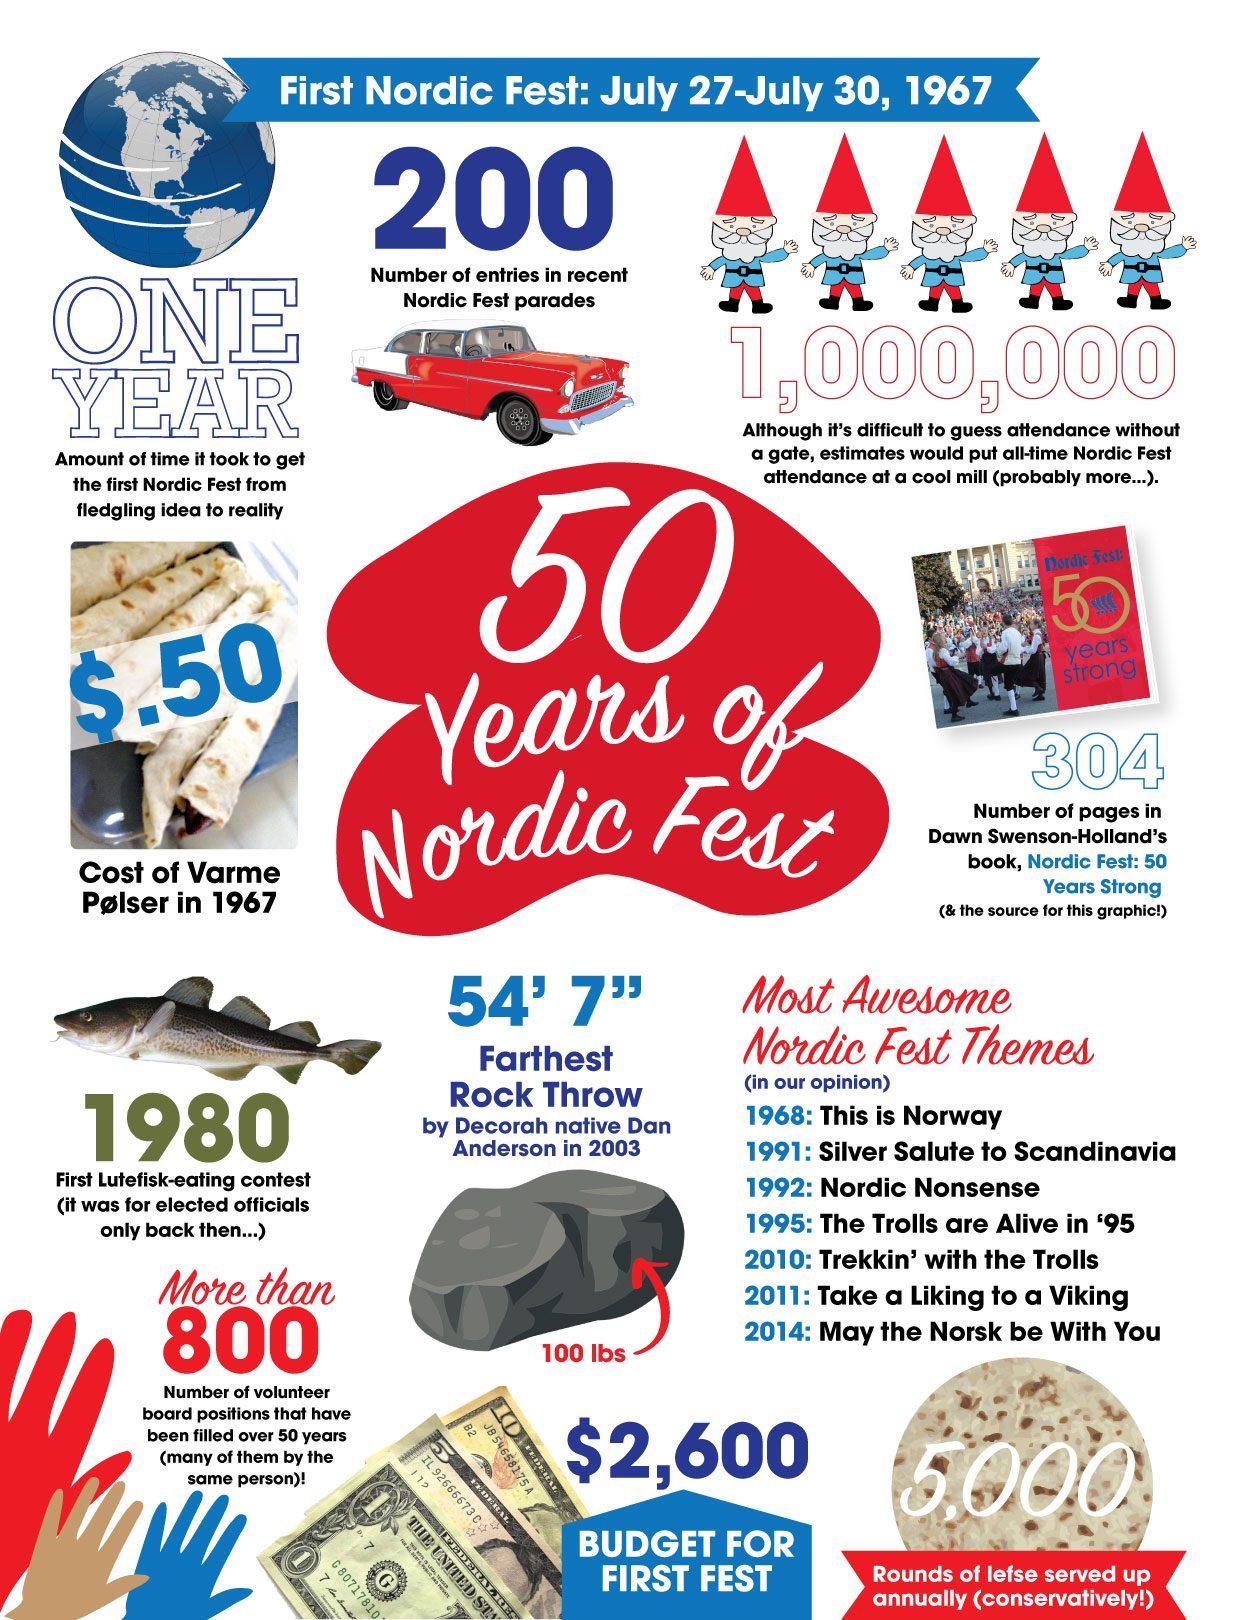 NordicFest_Infographic_Summer16